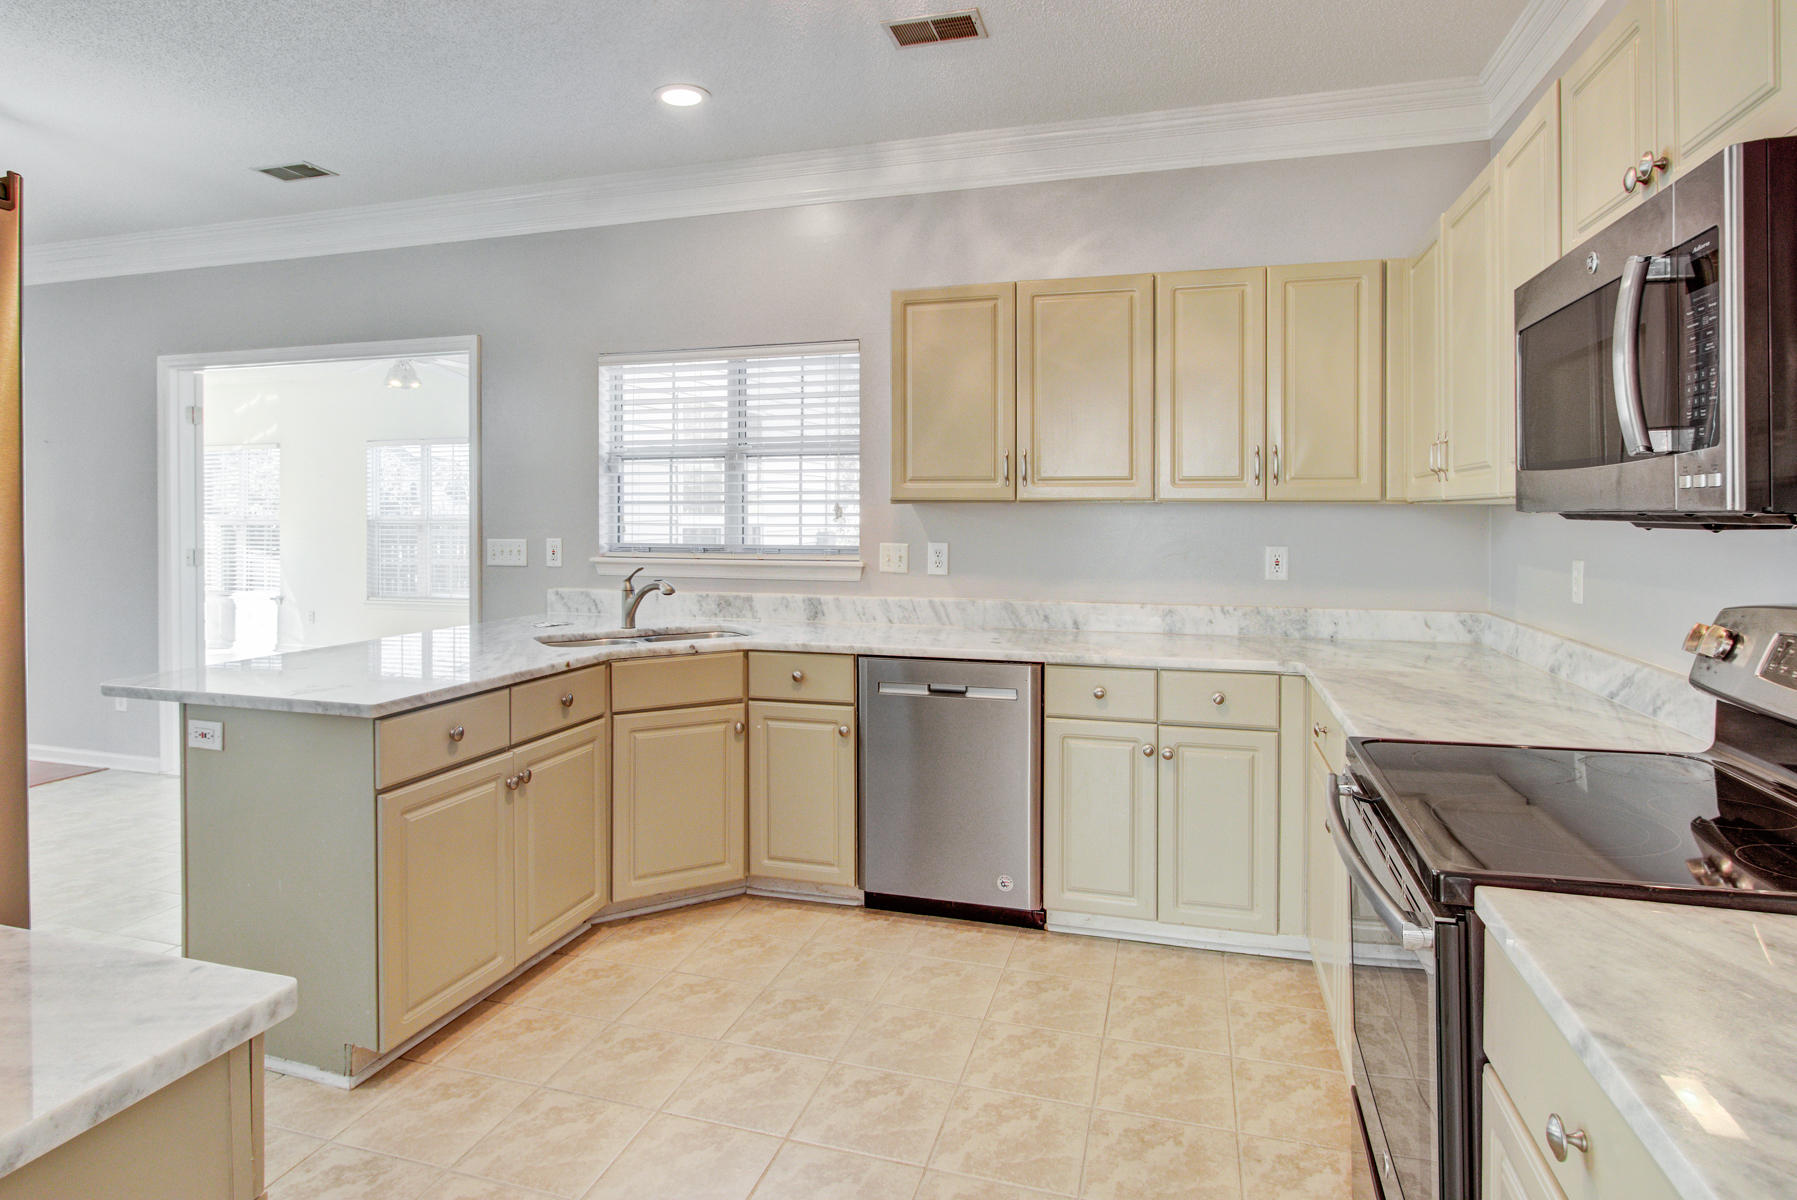 Village Green Homes For Sale - 3323 Hearthside, Charleston, SC - 1